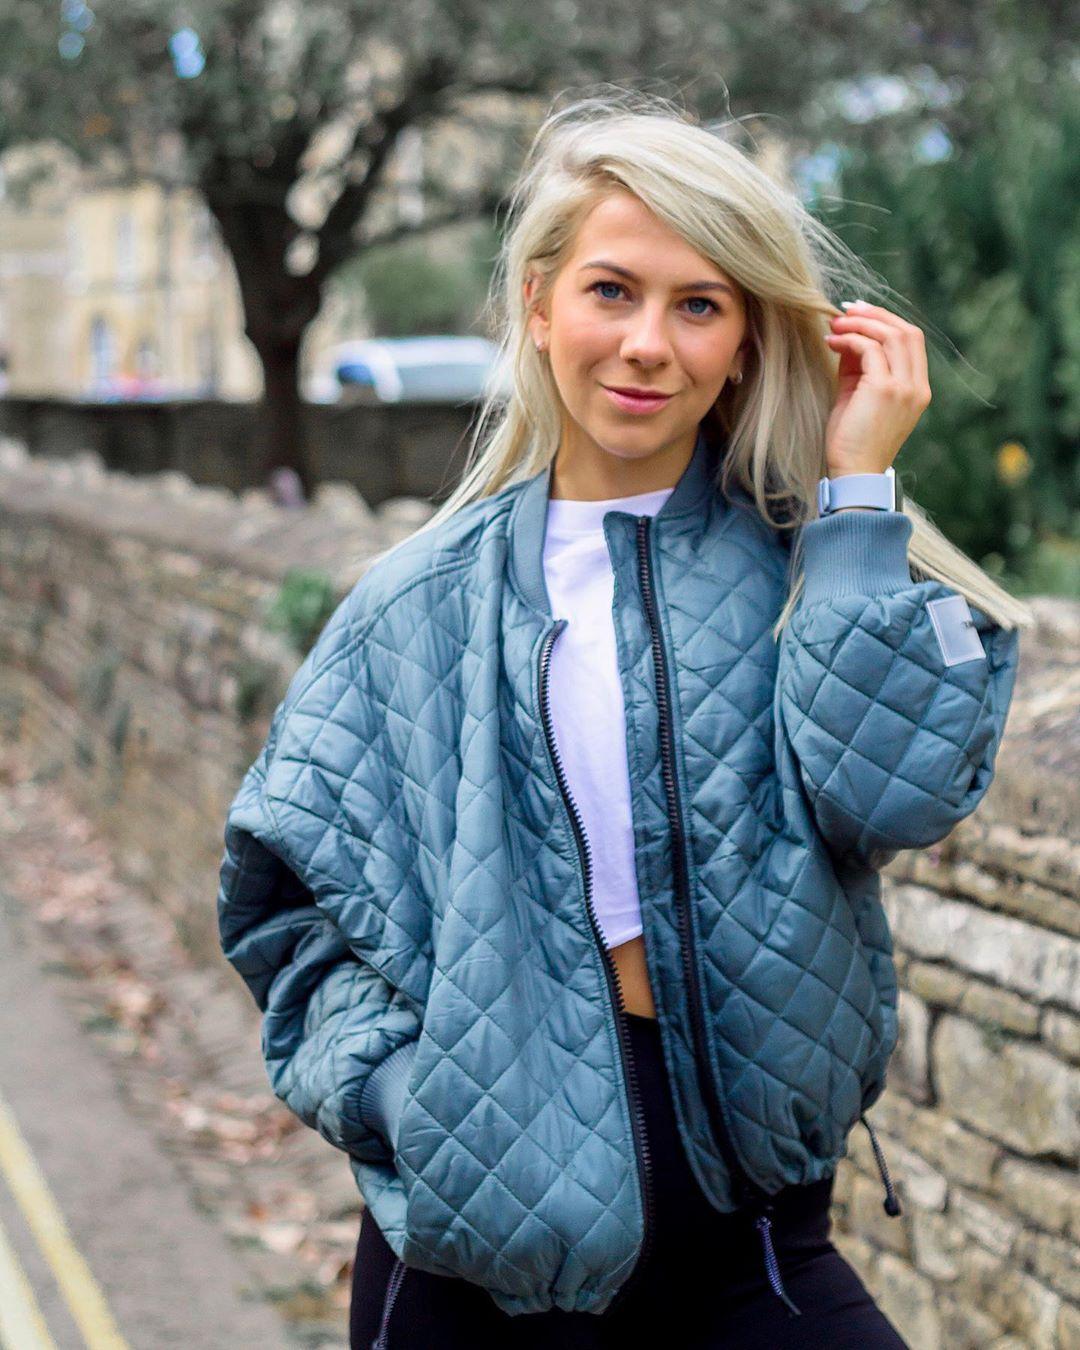 Katie-Nelson-Wallpapers-Insta-Fit-Bio-9